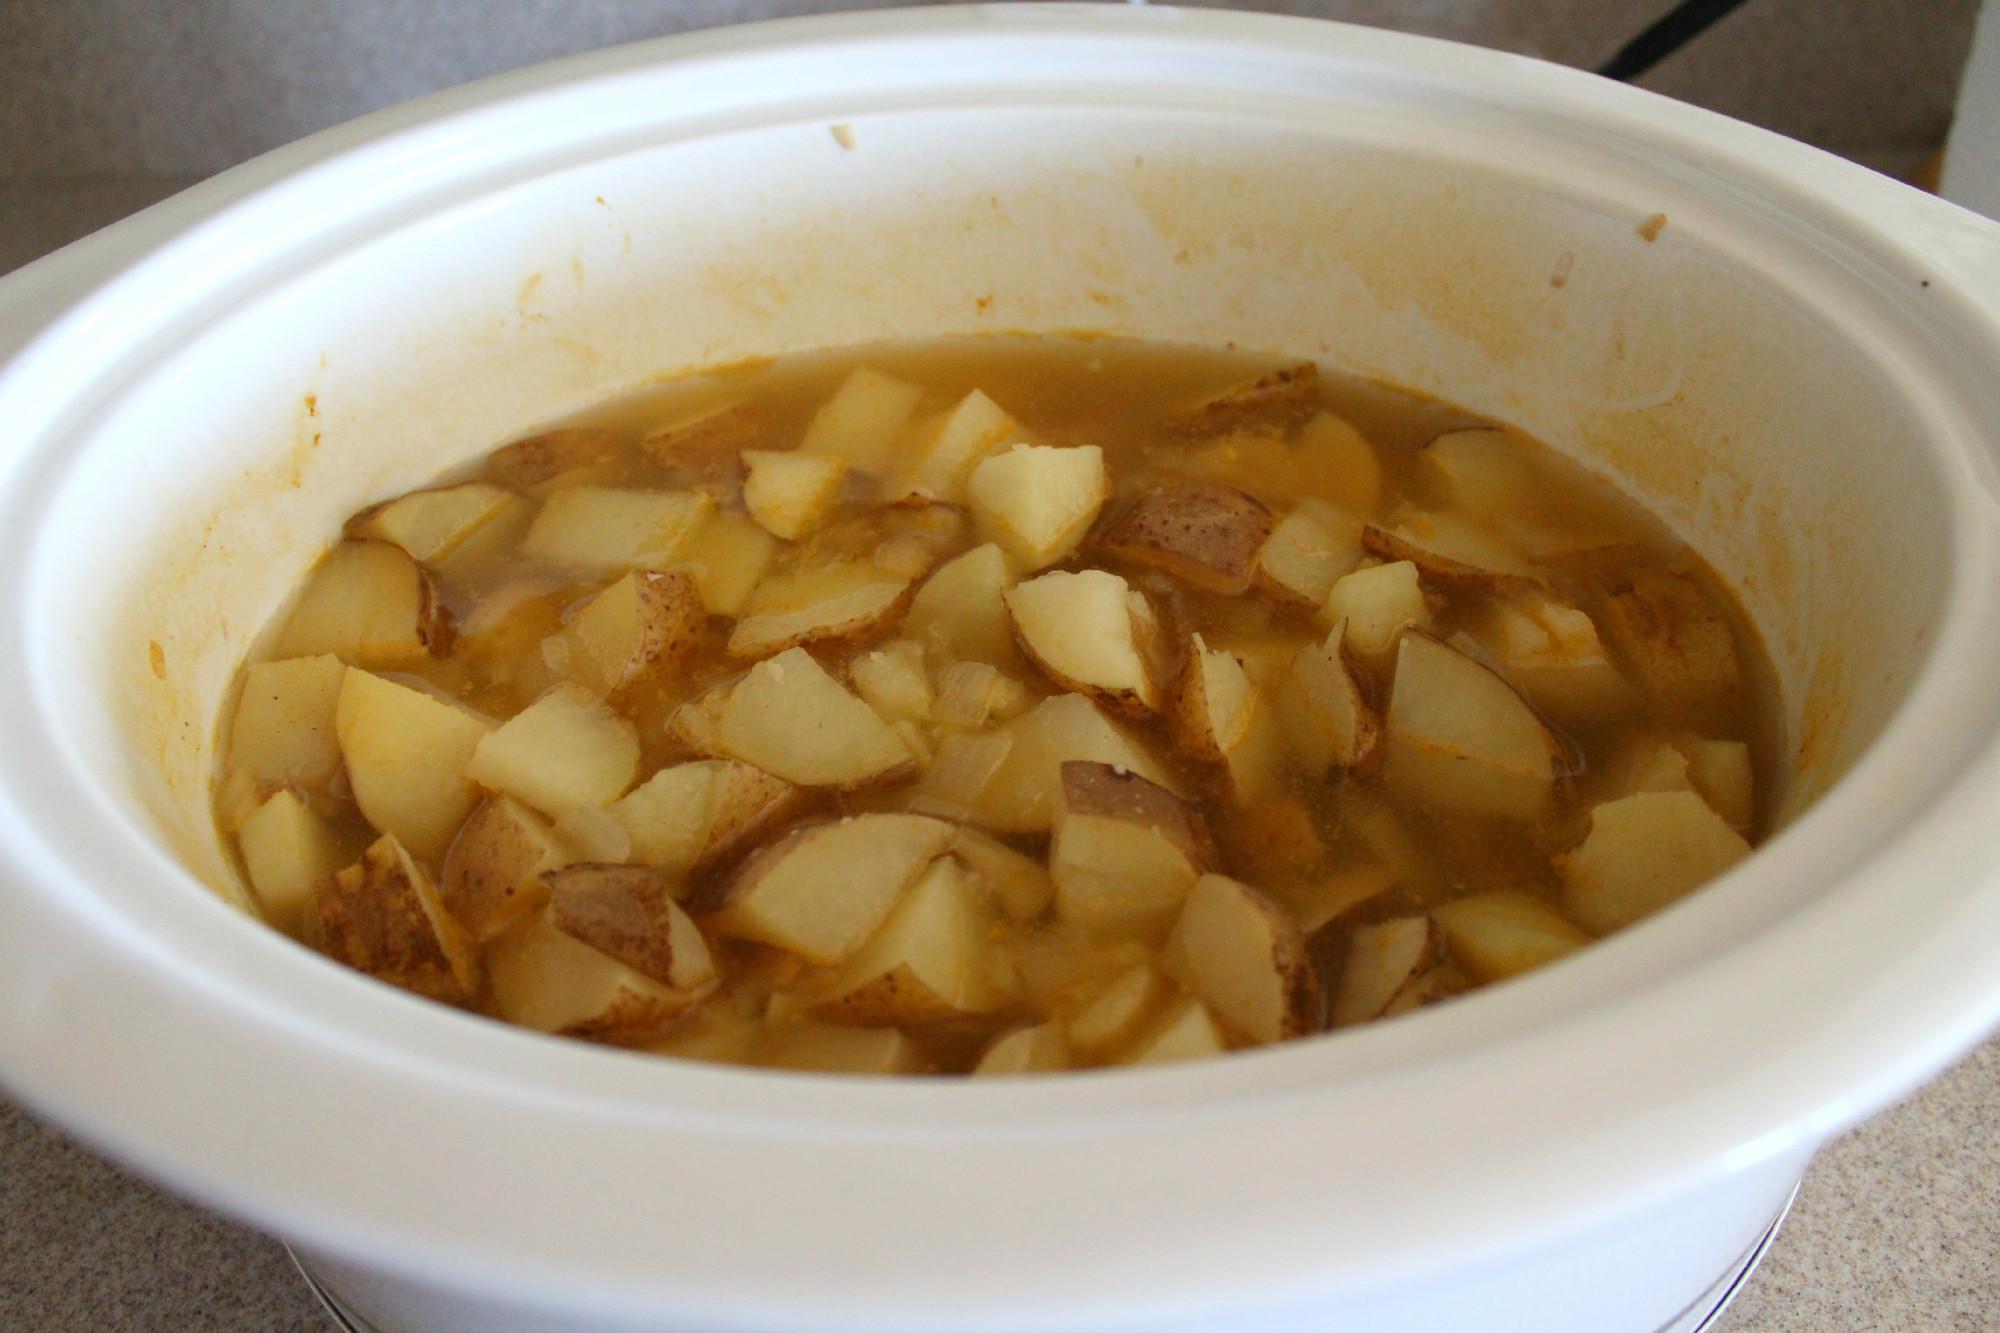 Crock Pot Potato Recipes  Easy Crock Pot Potato Soup Recipe Teaspoon Goodness